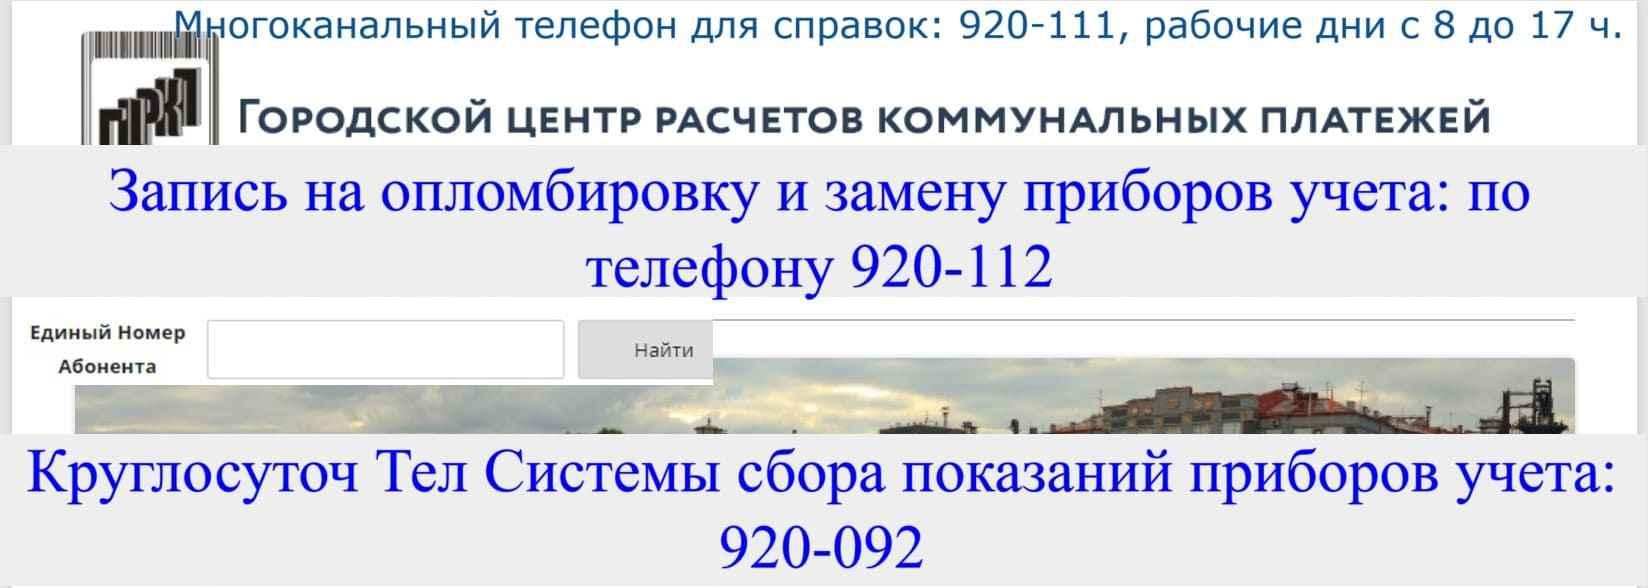 ГЦРКП РФ передача показаний